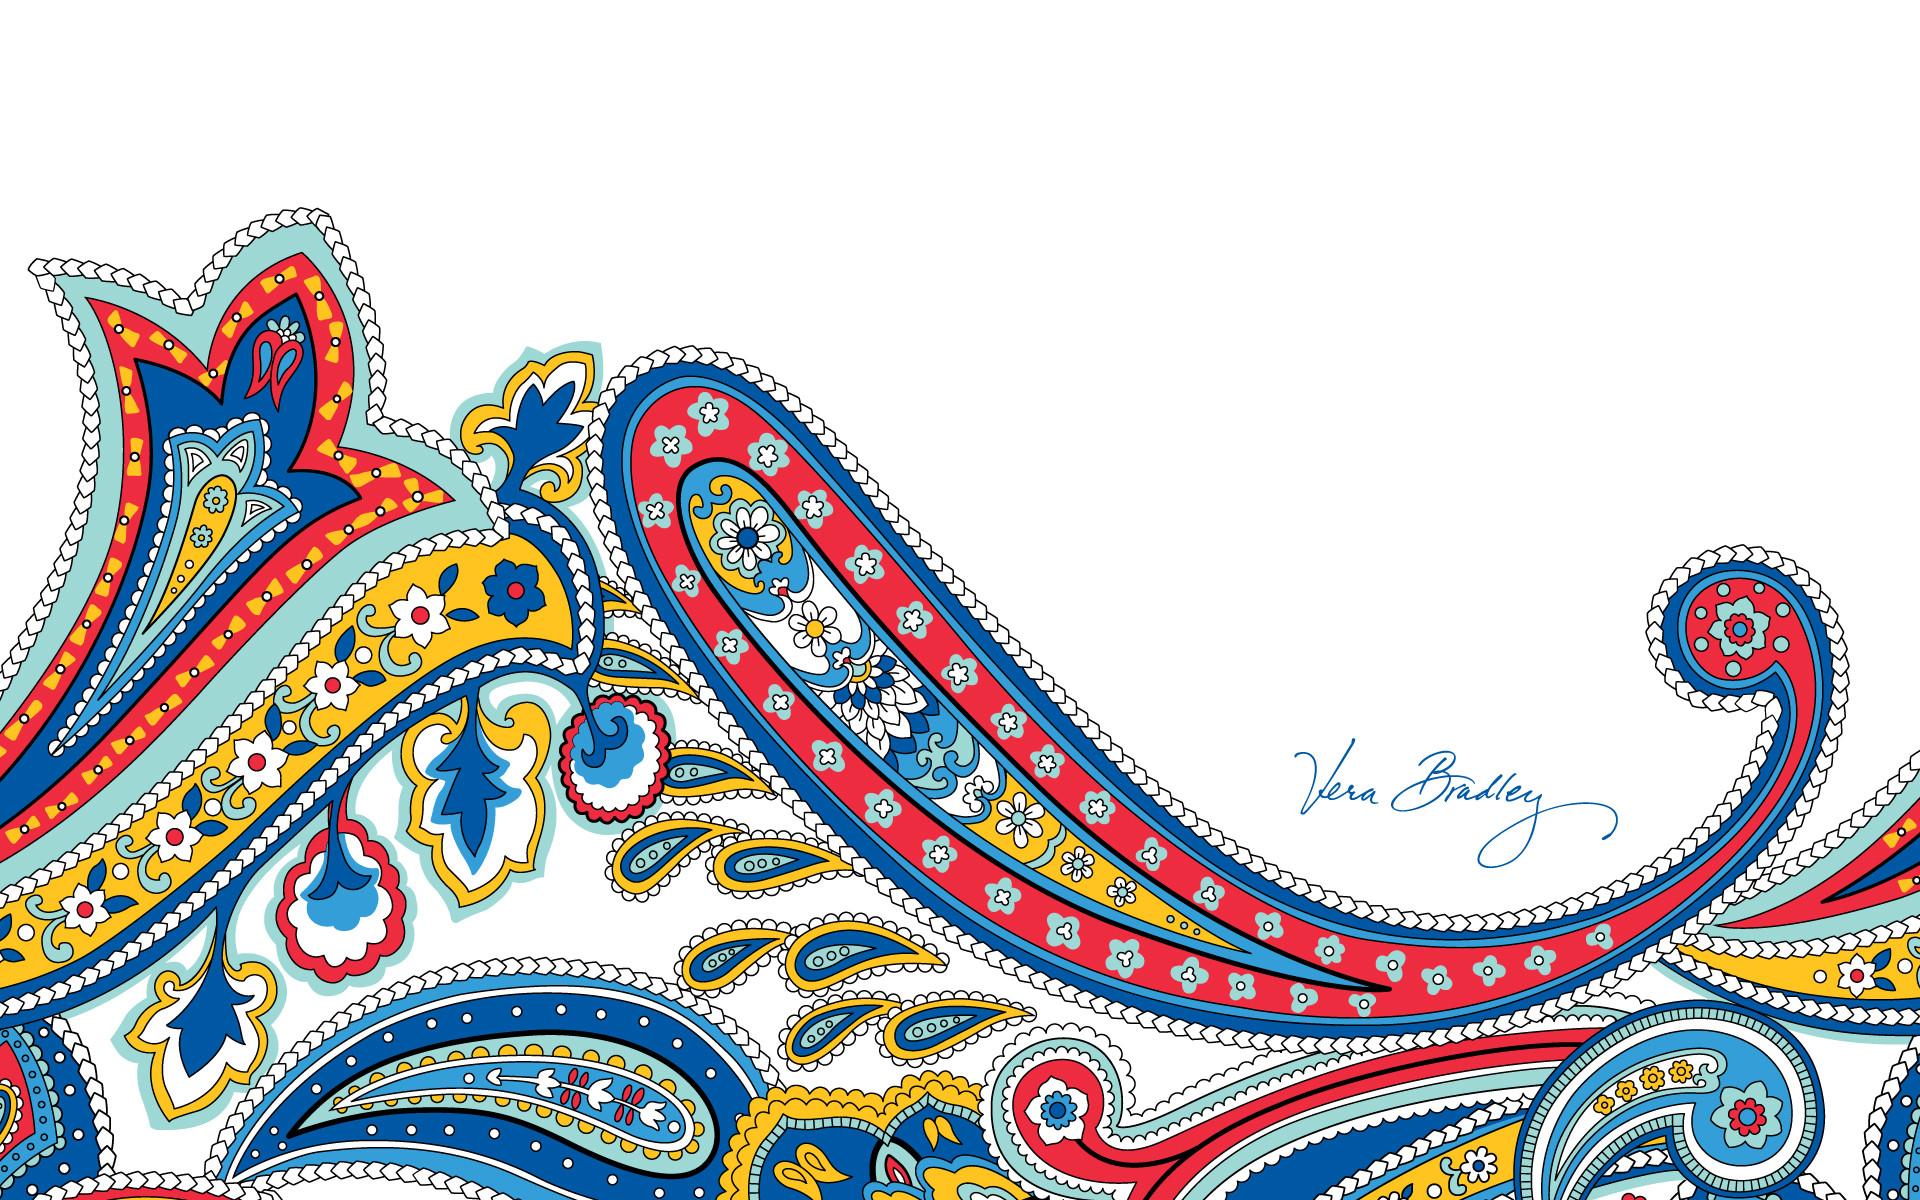 vera bradley patterns backgrounds | Vera Bradley Summer 2013 New Patterns + Desktop  Wallpapers .